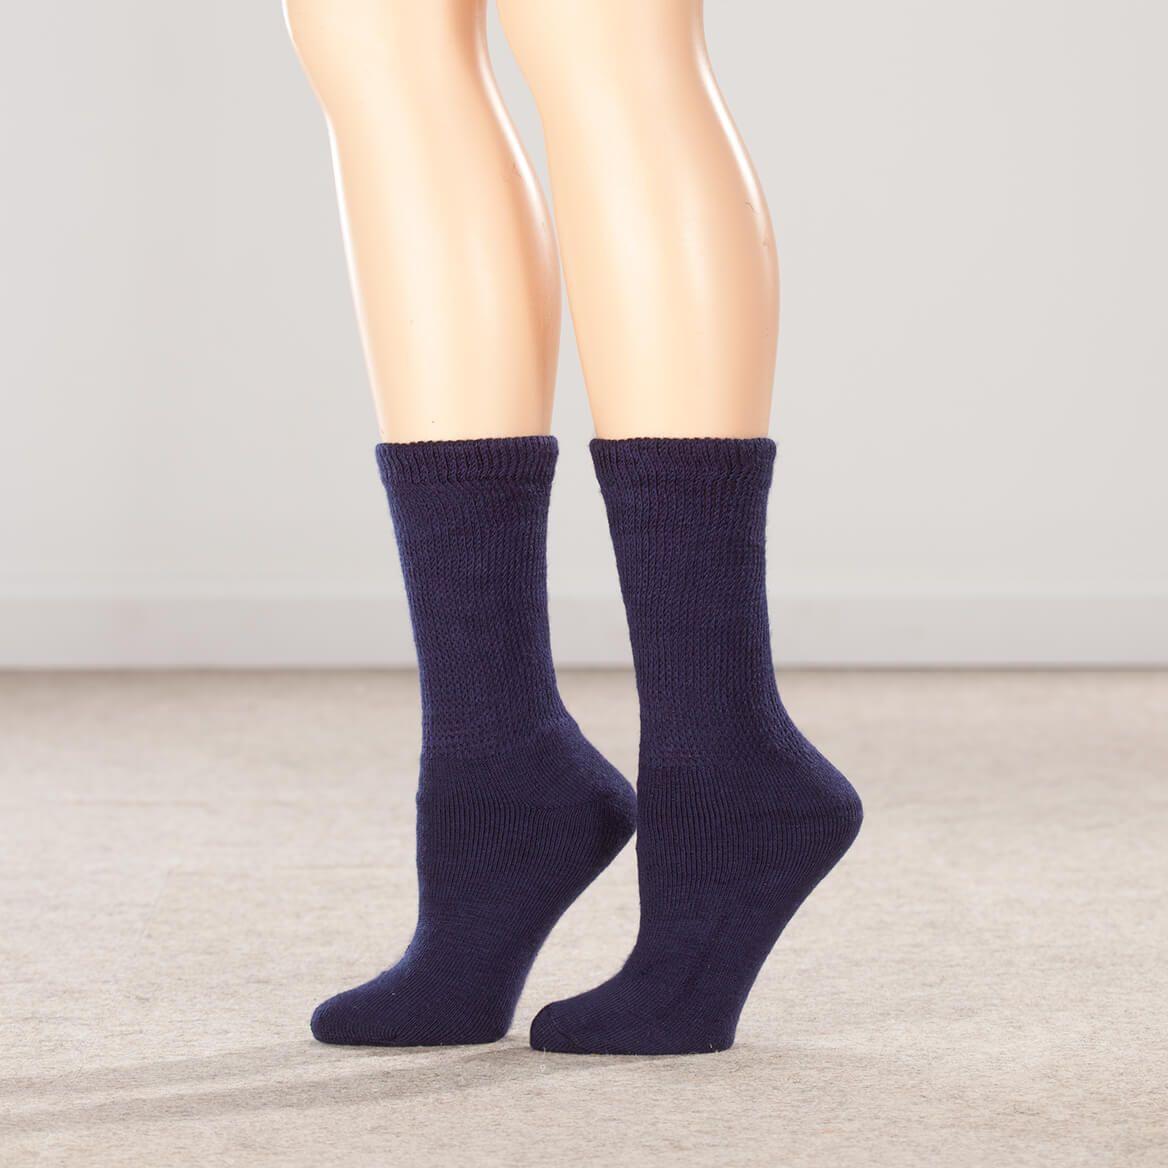 Silver Steps™ Extra Plush Diabetic Socks - 3 Pack-352253